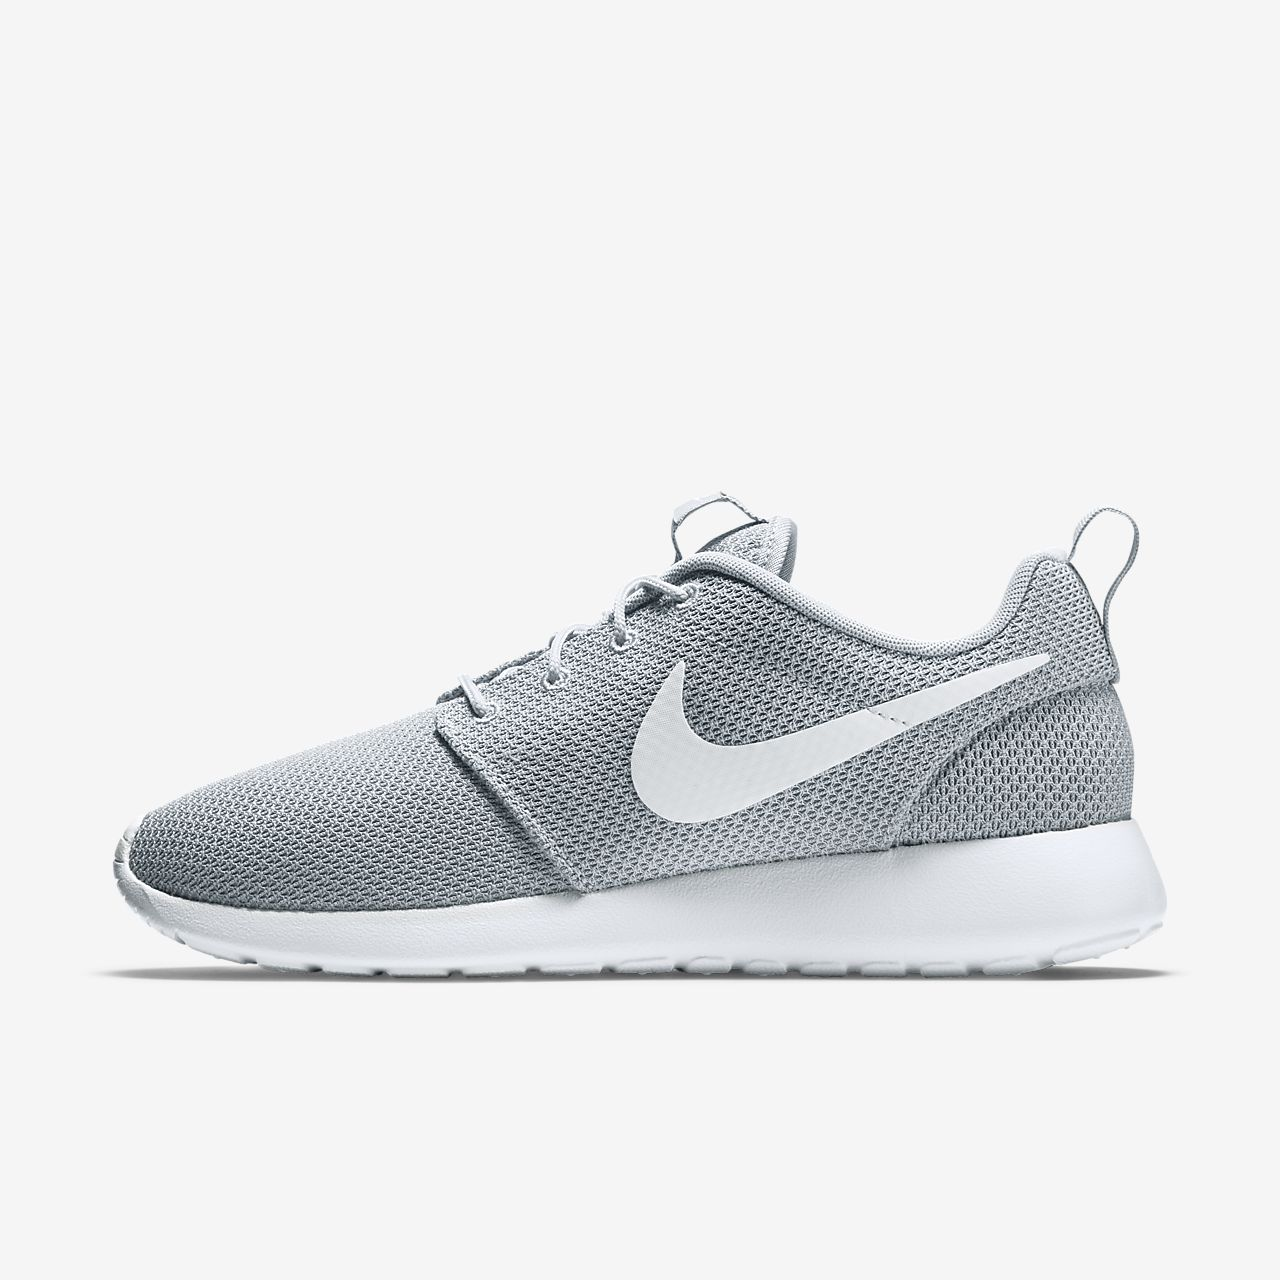 4b419d4bf61f Nike Roshe One Men s Shoe. Nike.com